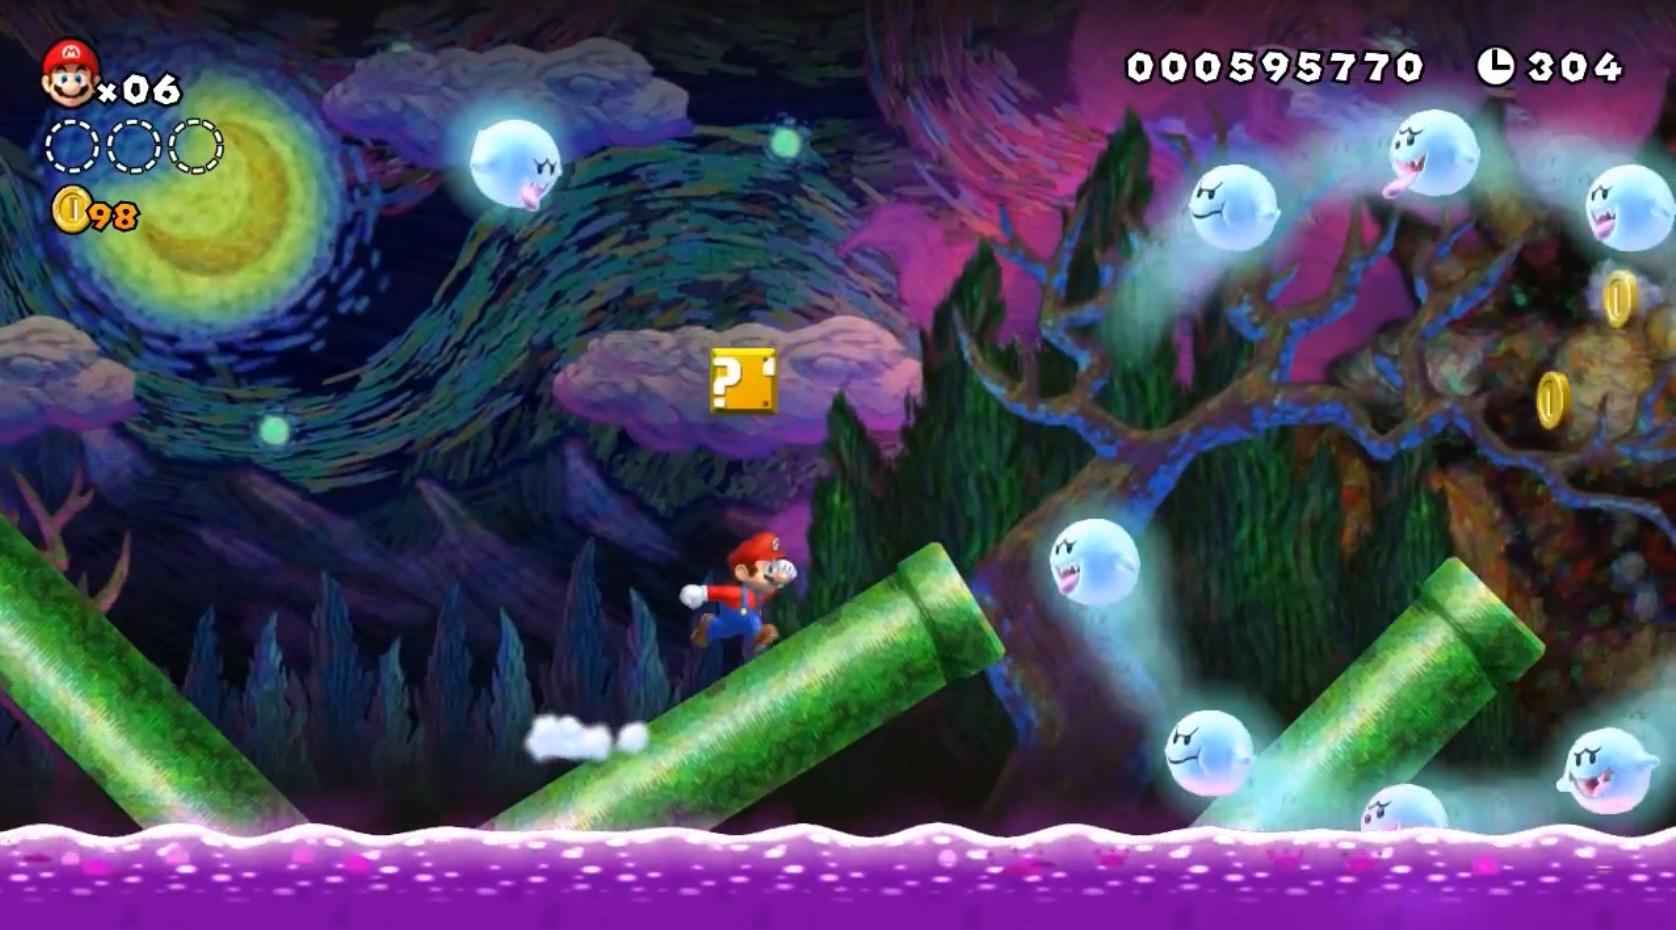 Картинки по запросу New Super Mario Bros U gameplay